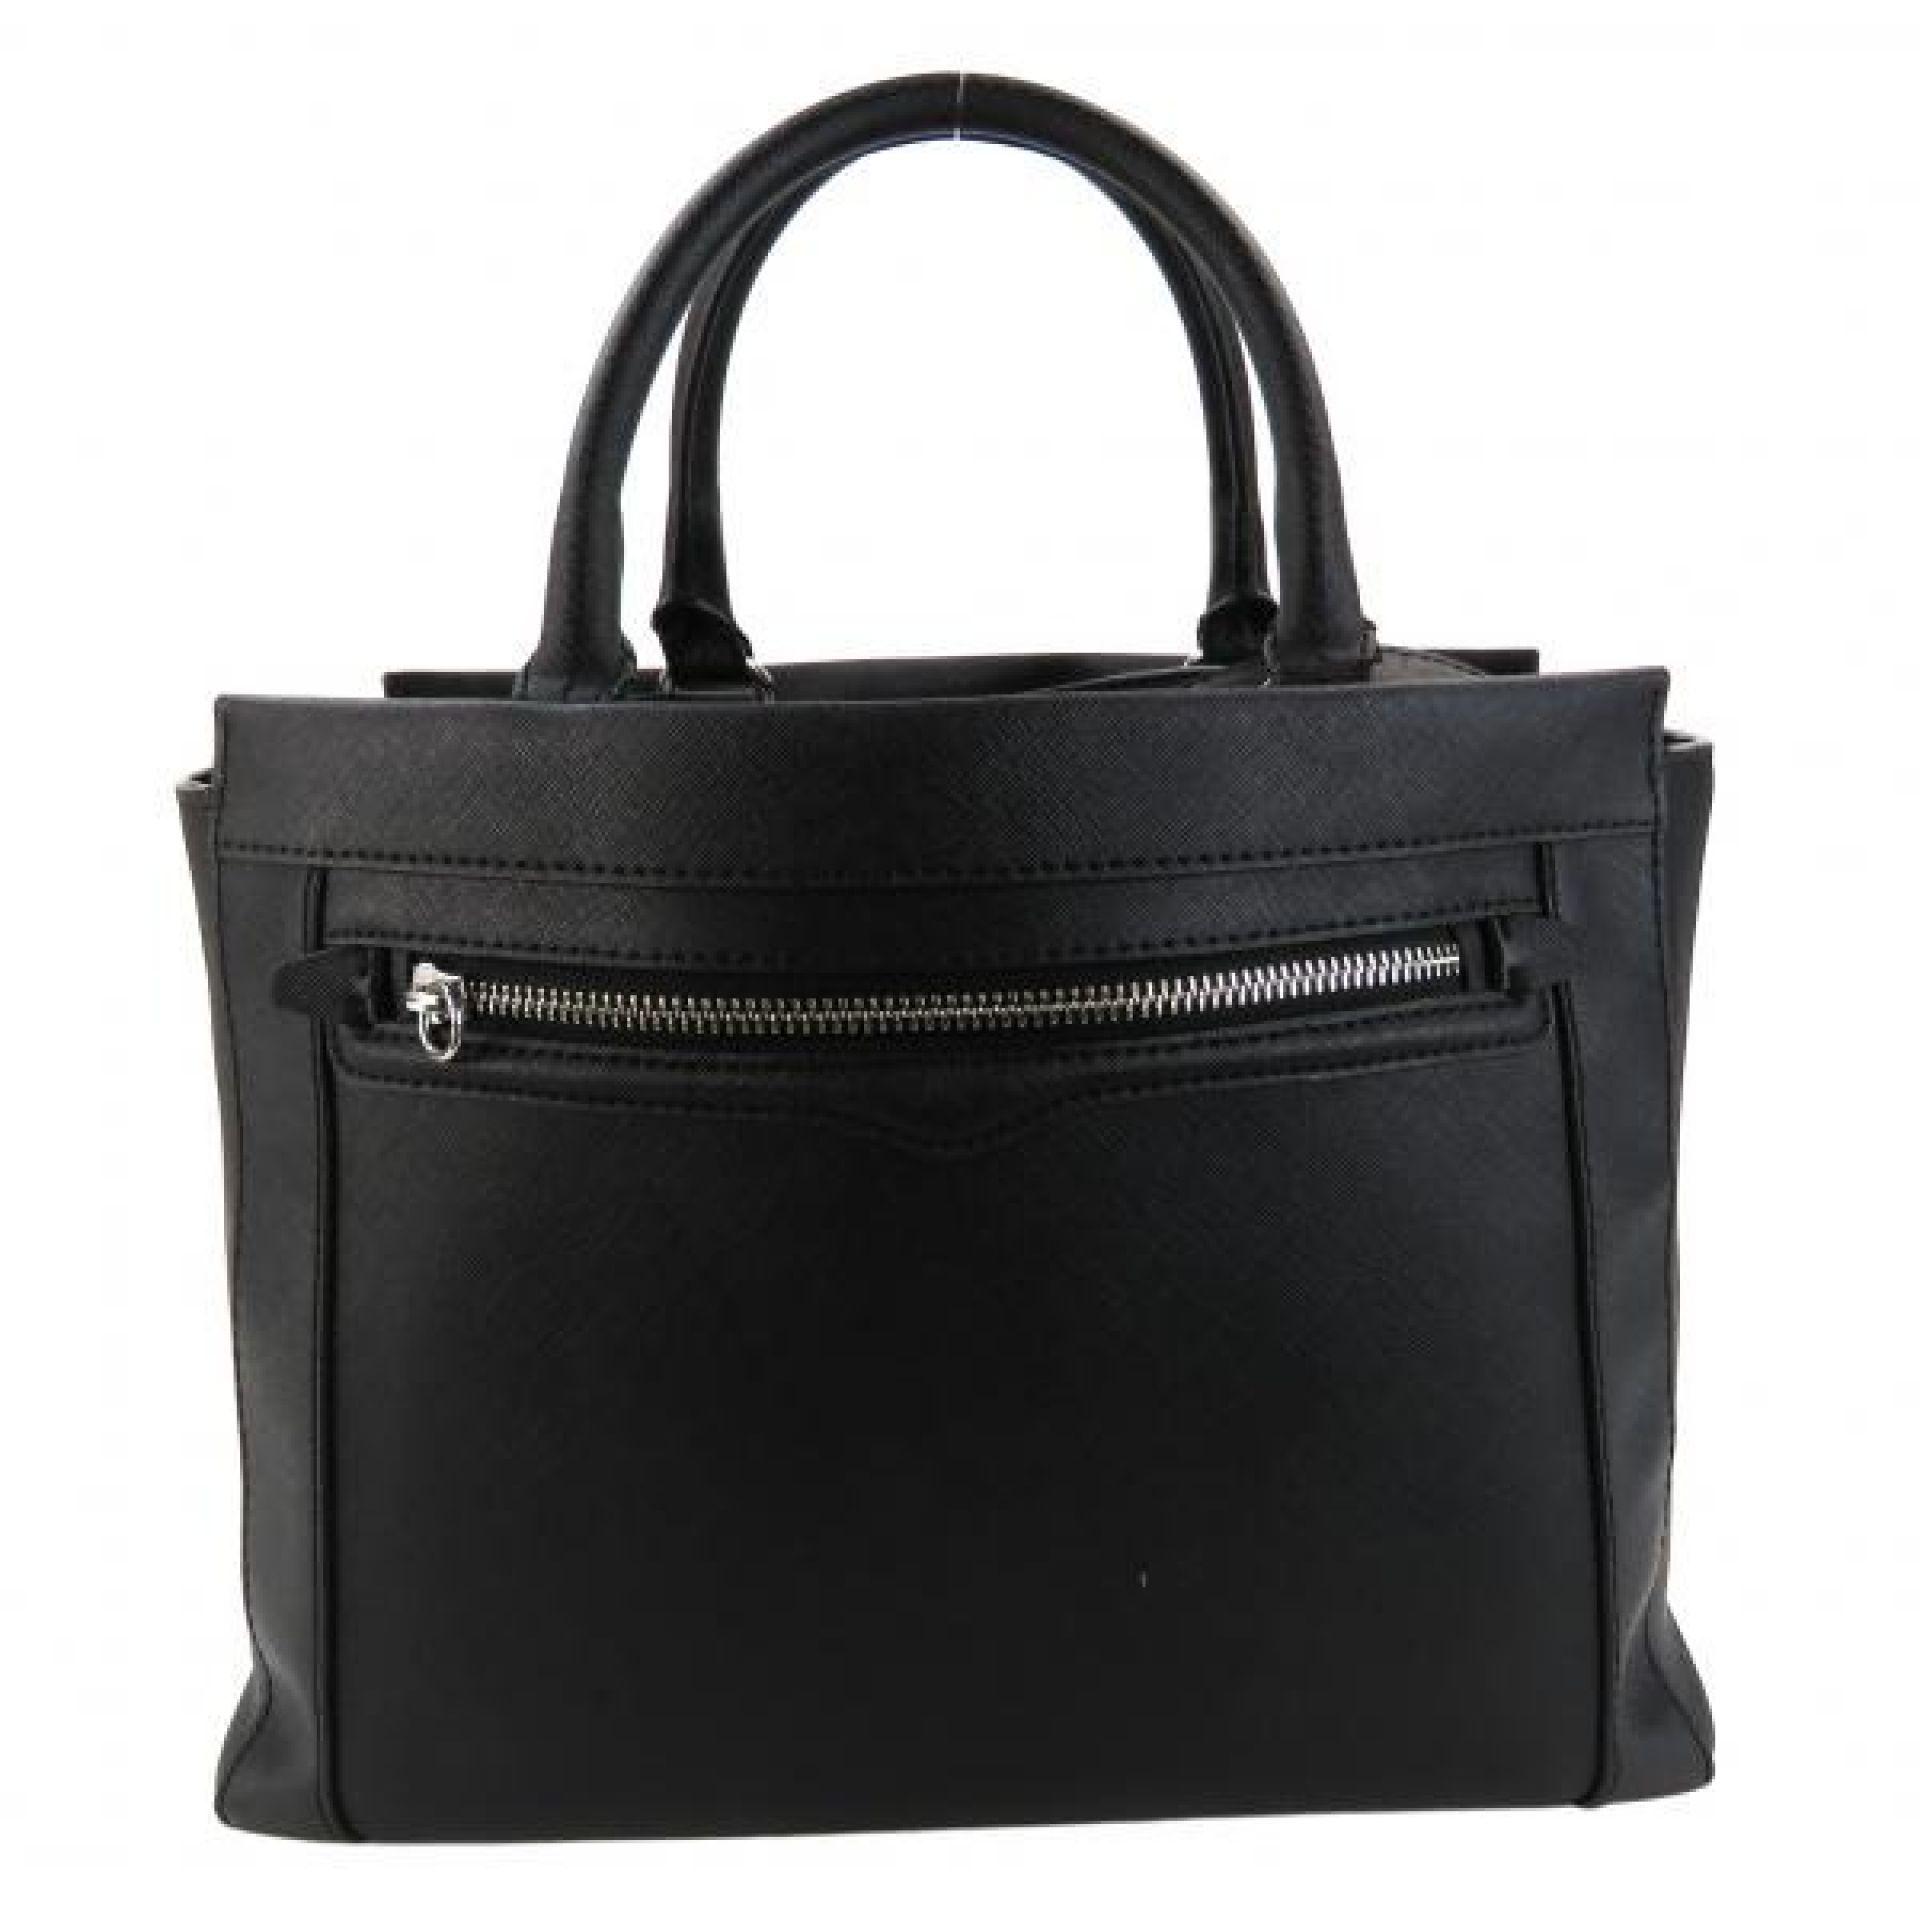 Rebecca Minkoff Black Saffiano Leather Bonnie Convertible Satchel Bag